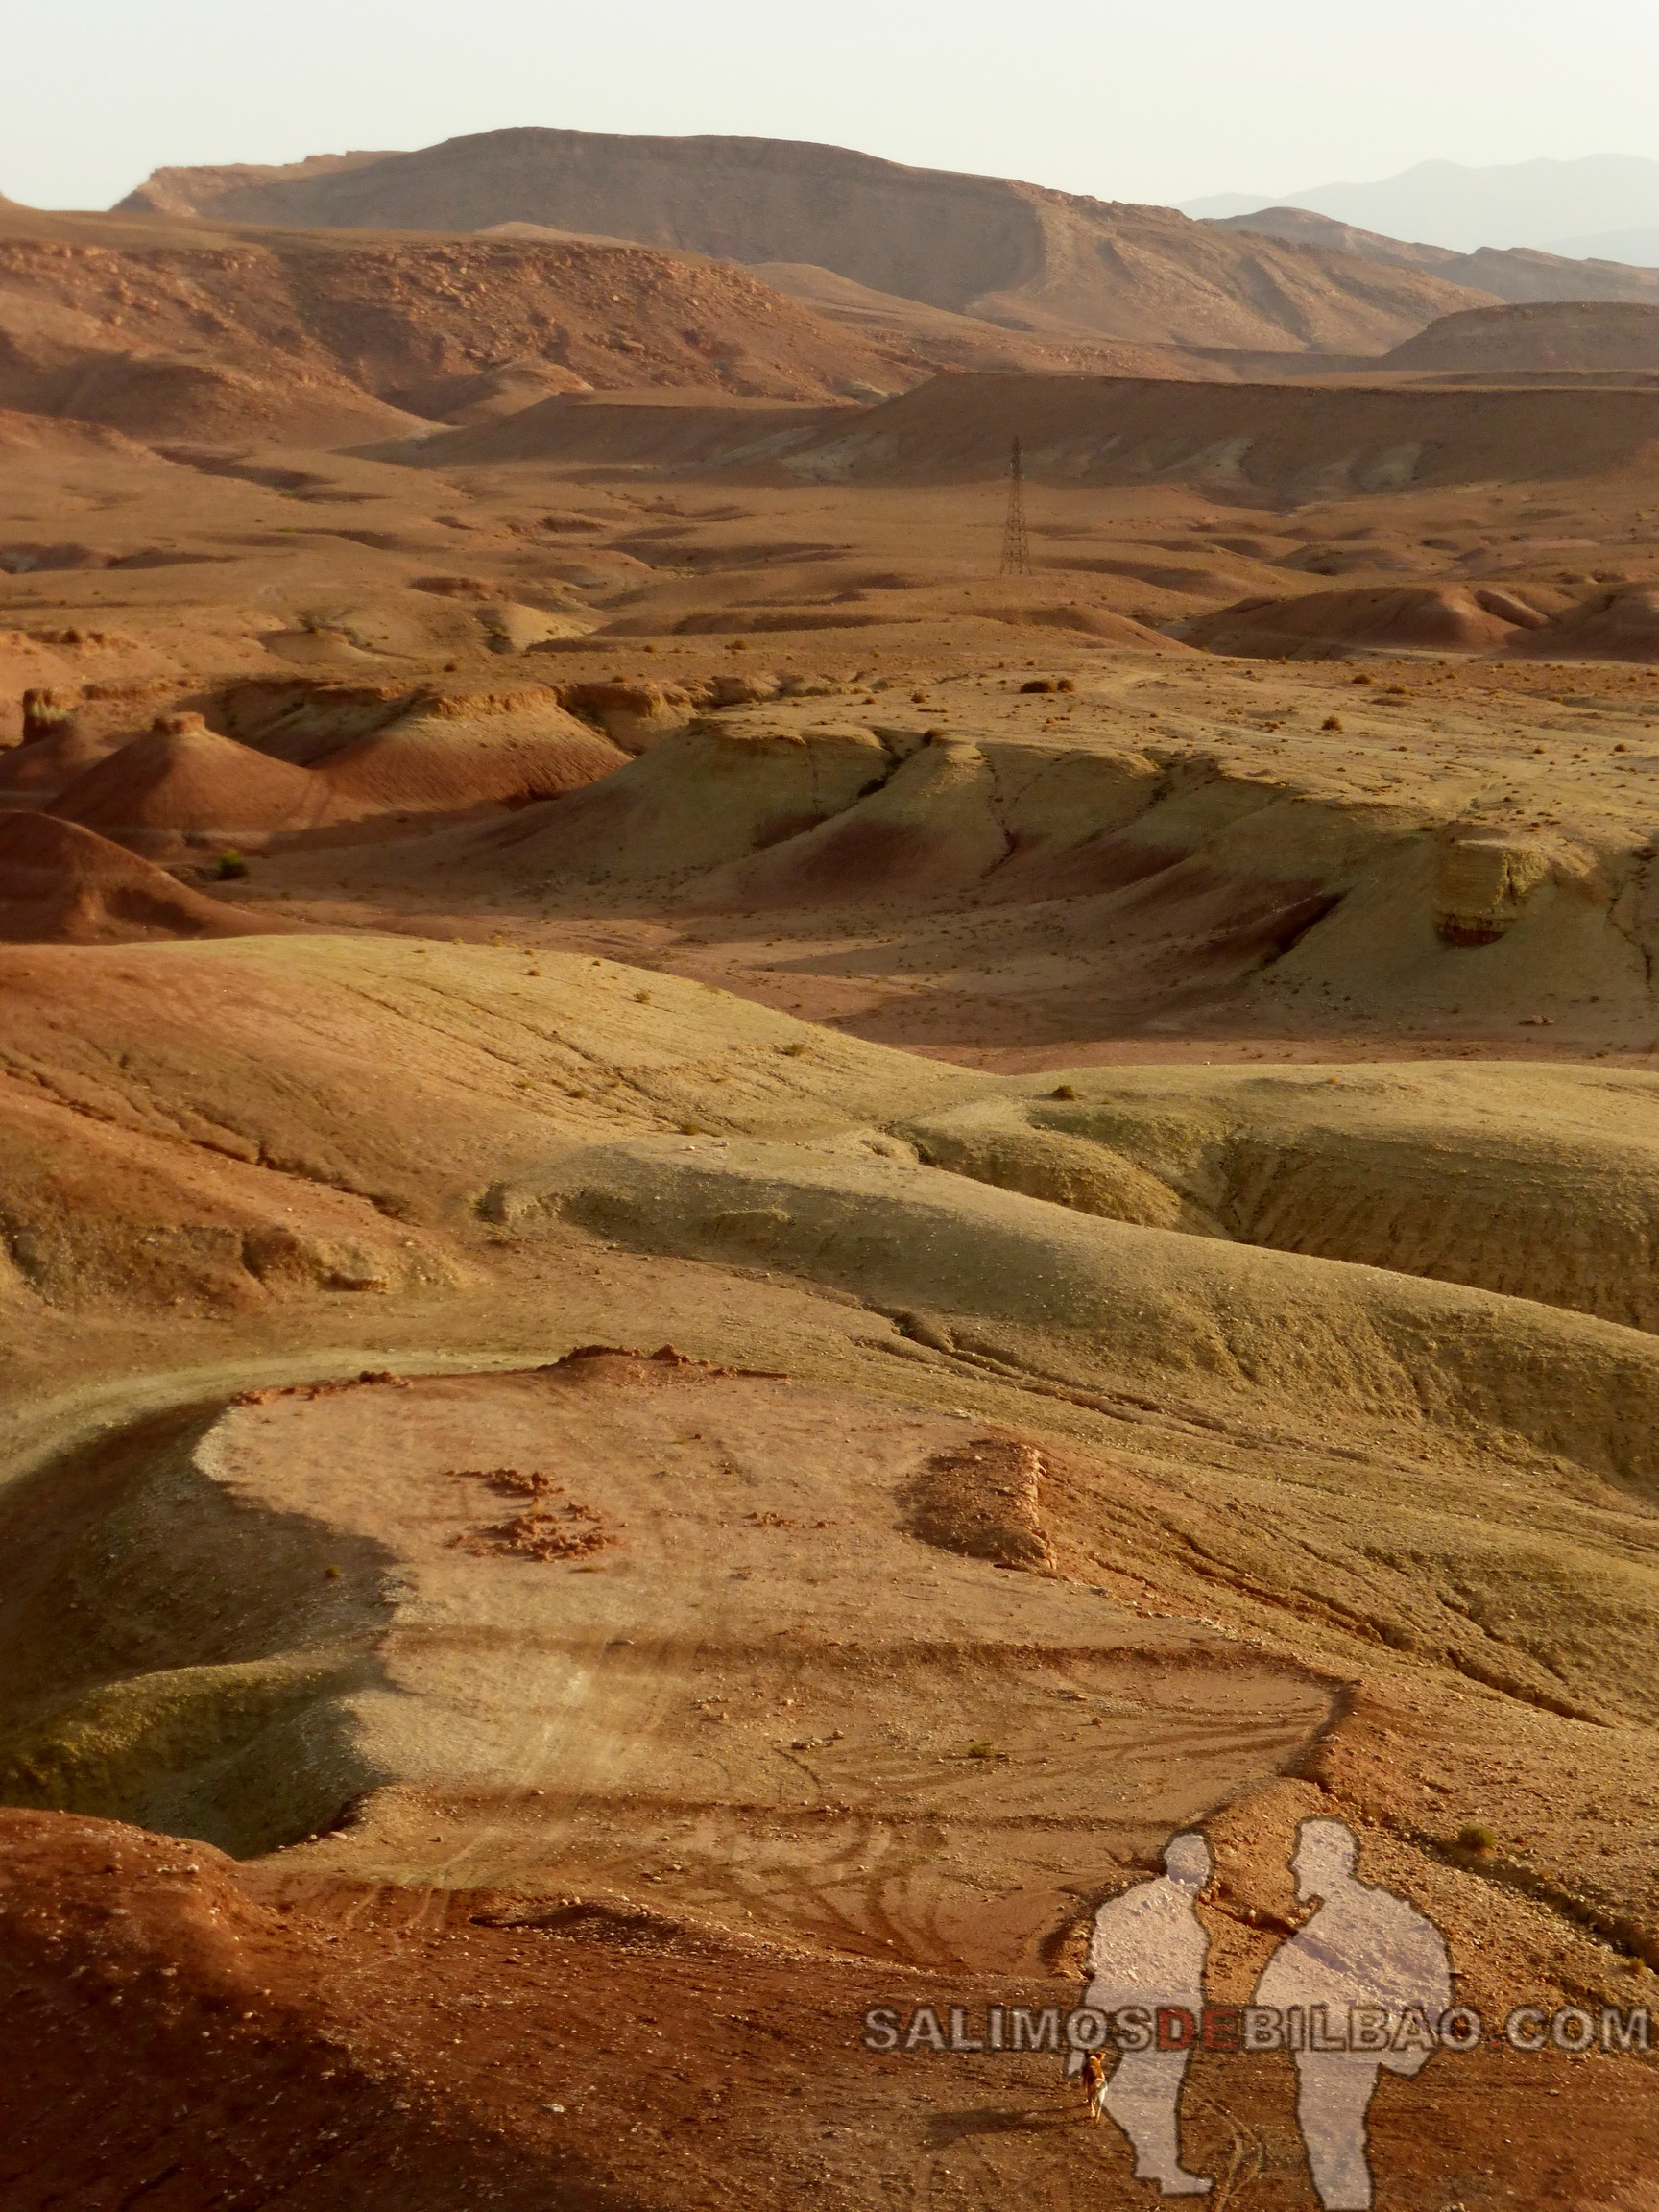 598. Rodeando el Kasbah Ait Ben Haddou